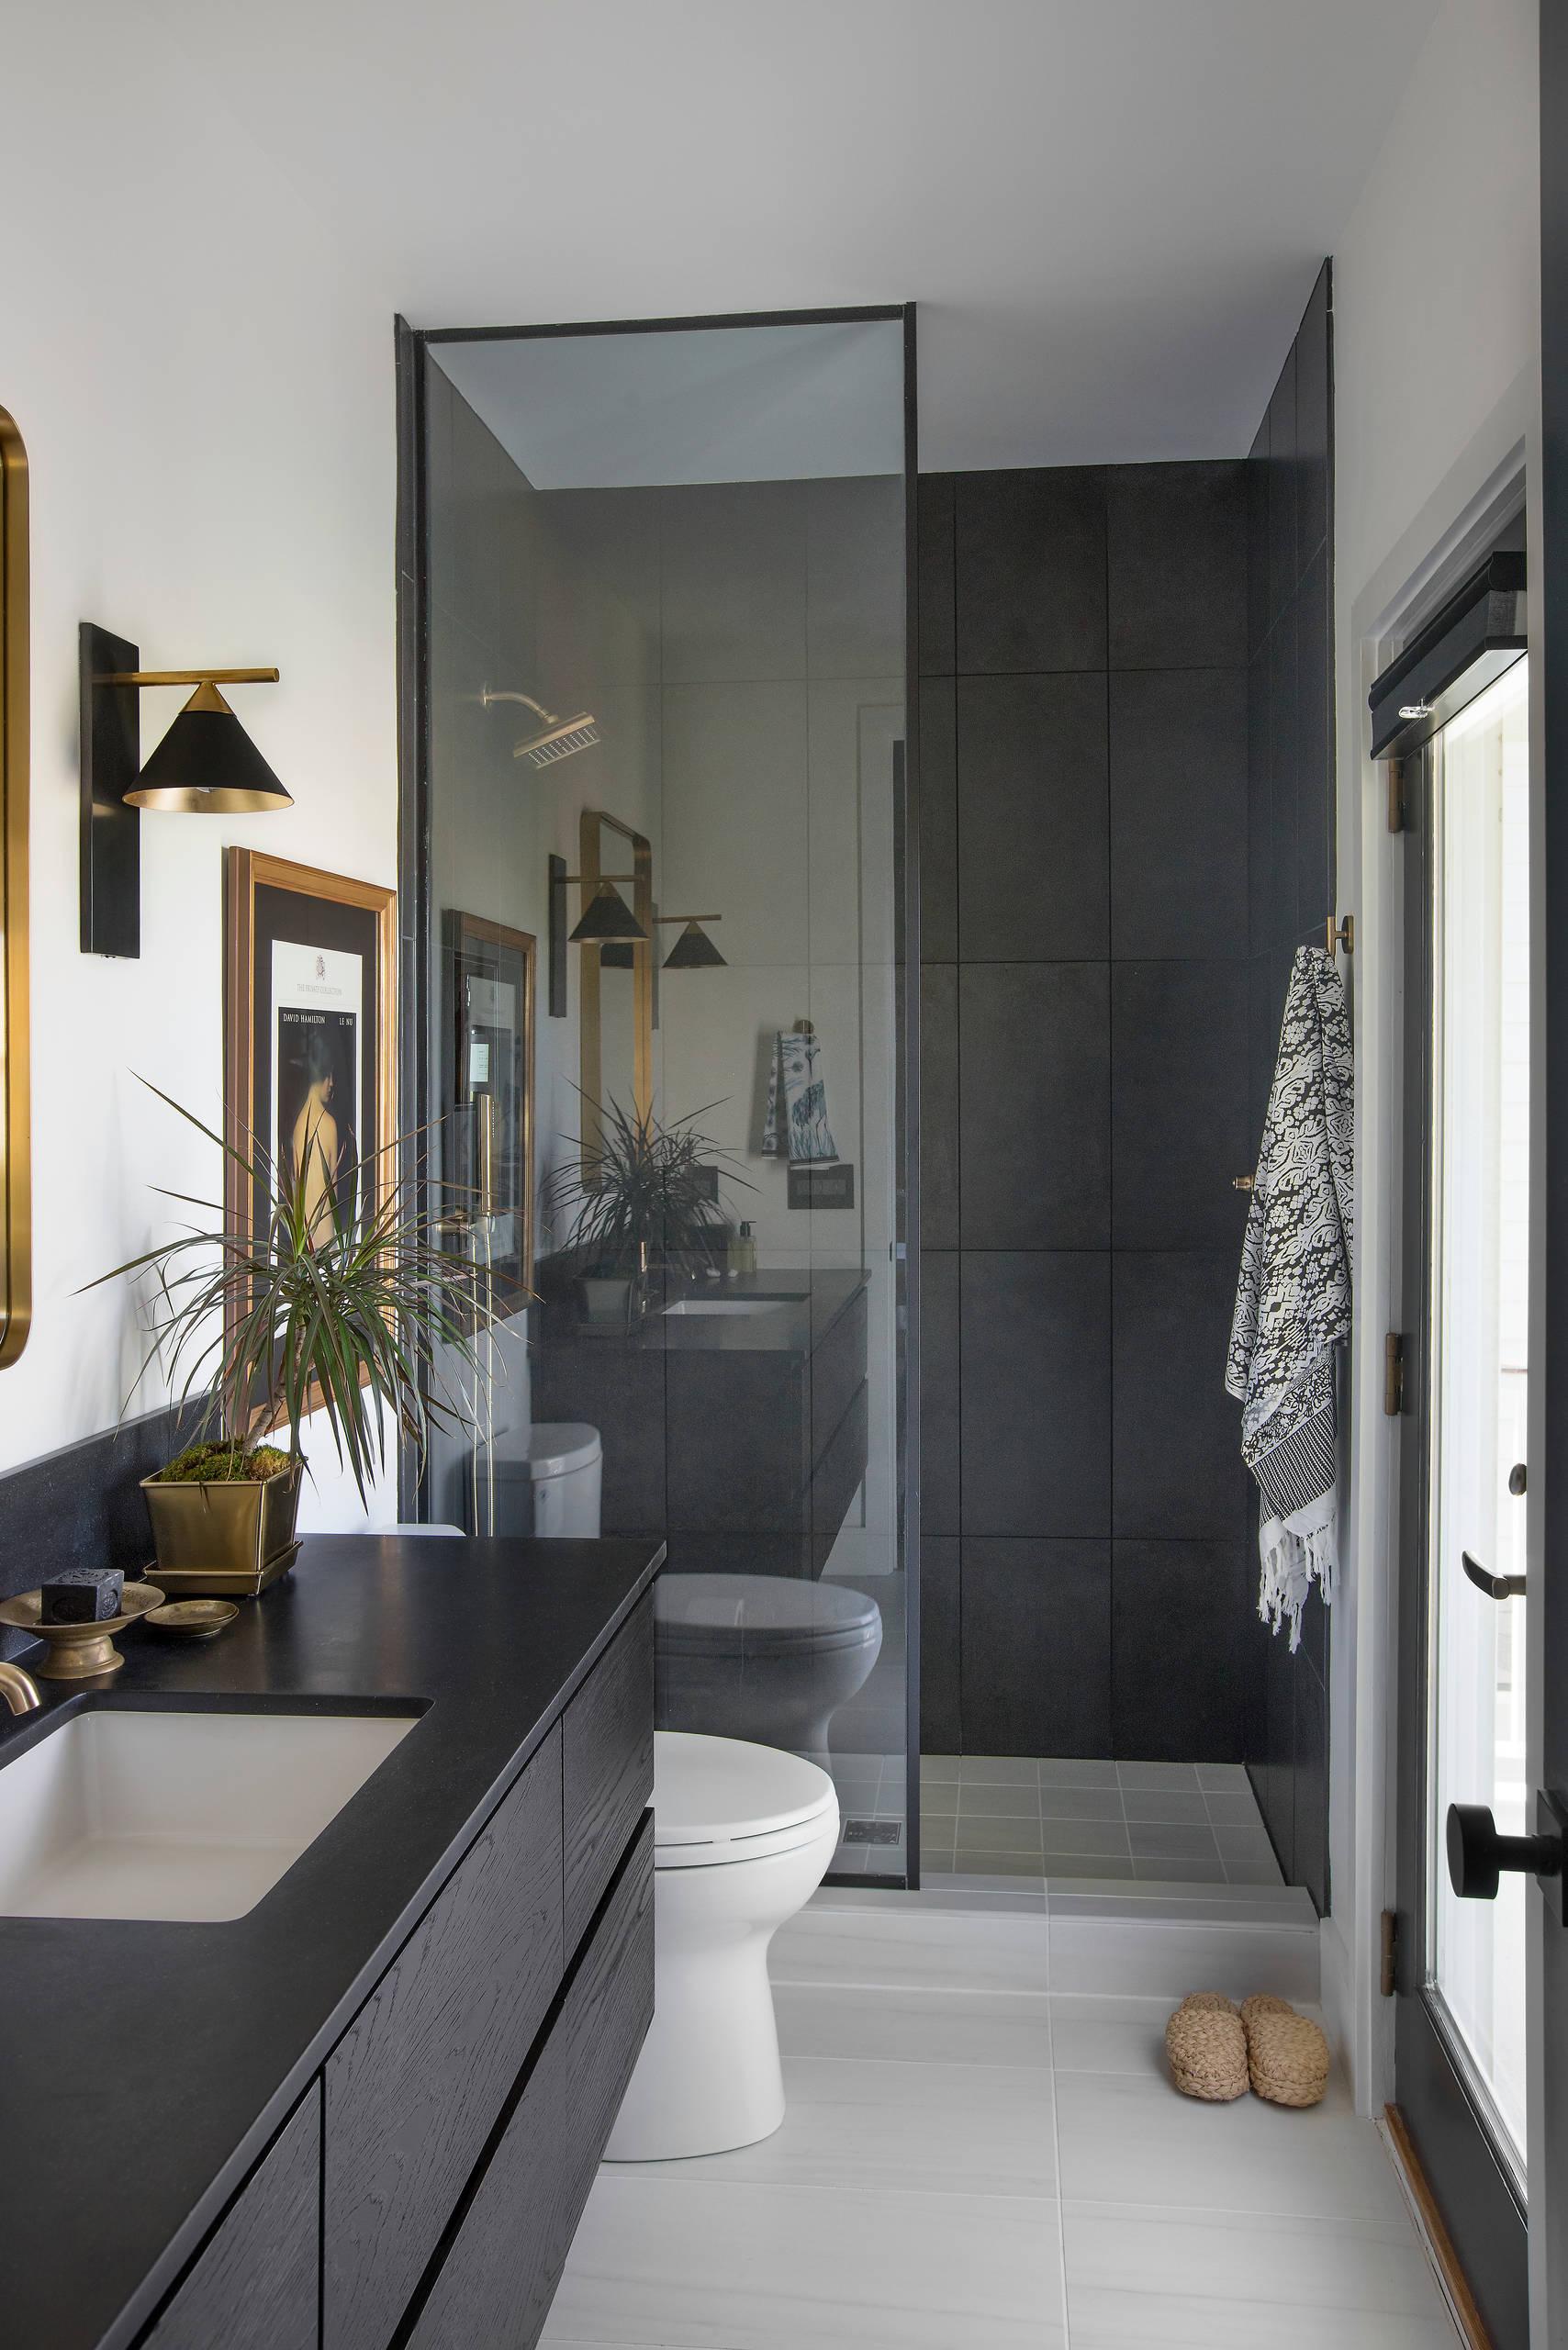 75 Beautiful Bathroom Pictures & Ideas | Houzz